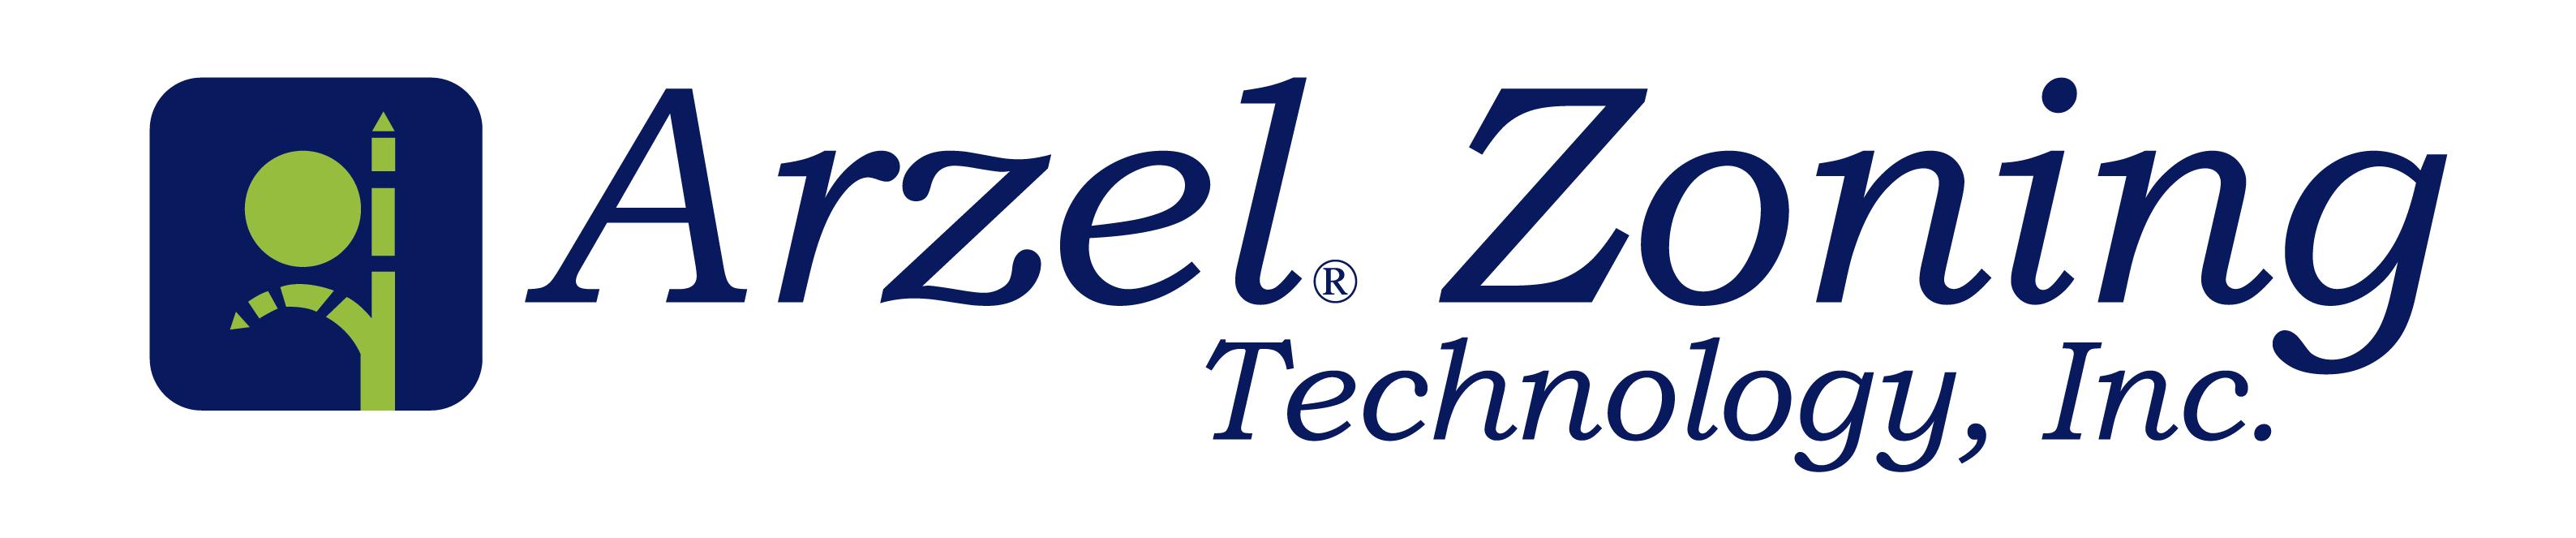 Arzel Zoning Technology, Inc.